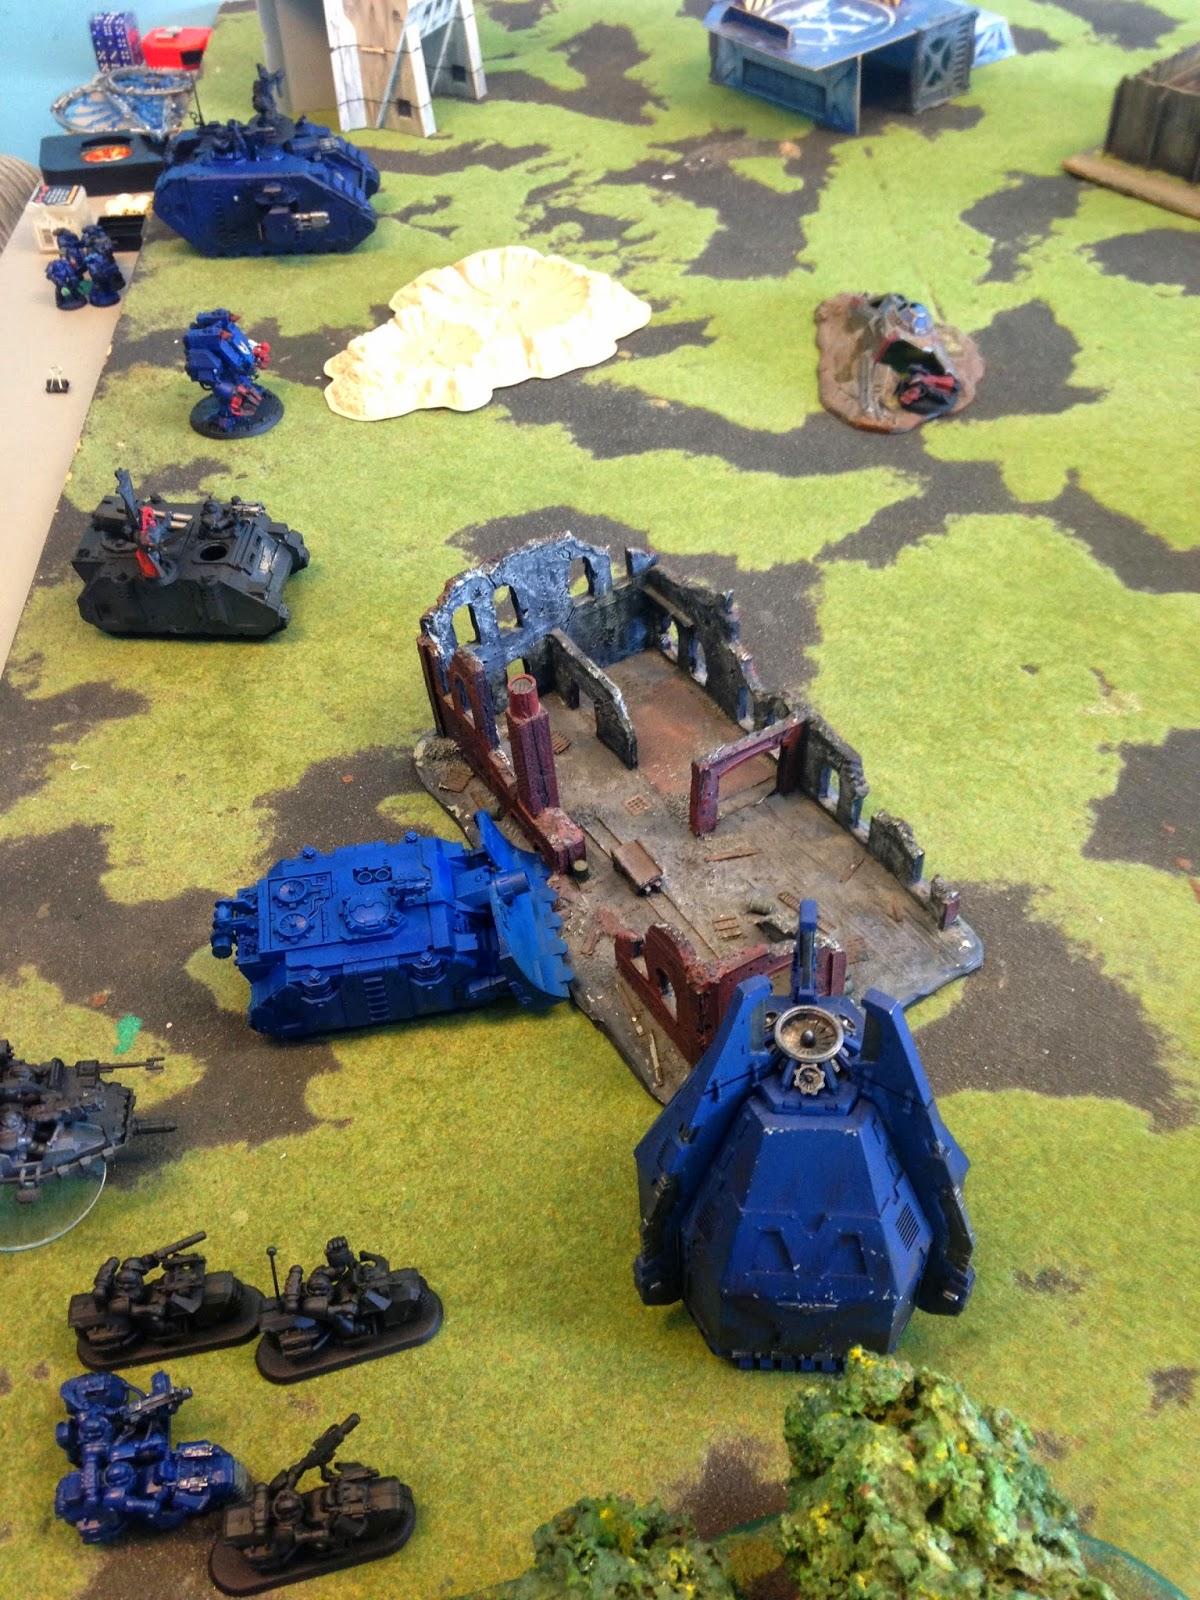 Space Marine Battle, Battle Gaming One, Space Marines vs. Space Marines